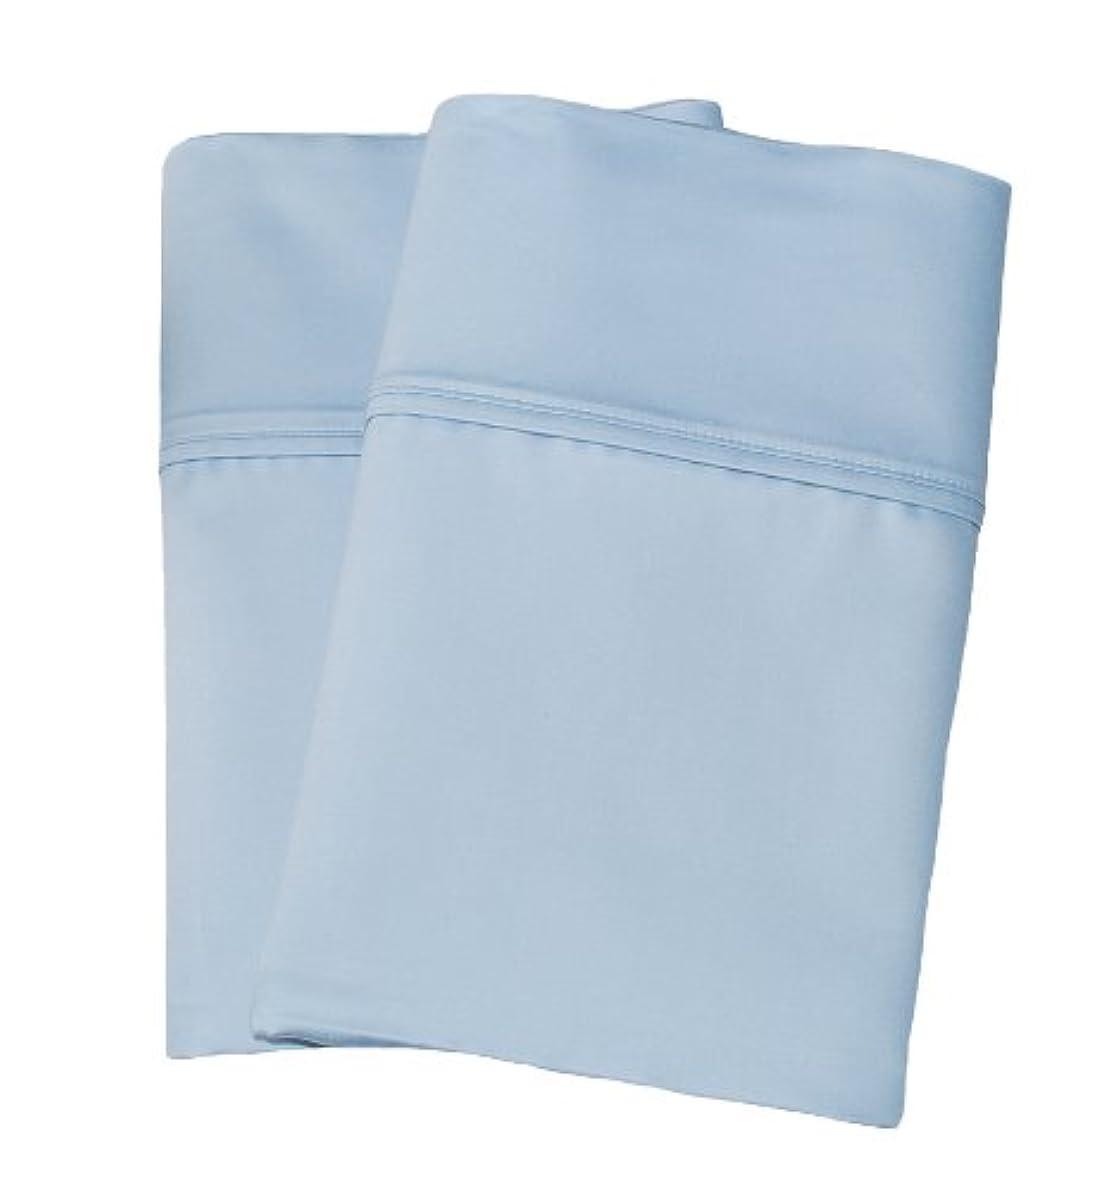 Cotton Blend 1000 Thread Count, Soft, Wrinkle Resistant, Standard 2-Piece Pillowcase Set Solid, Light Blue